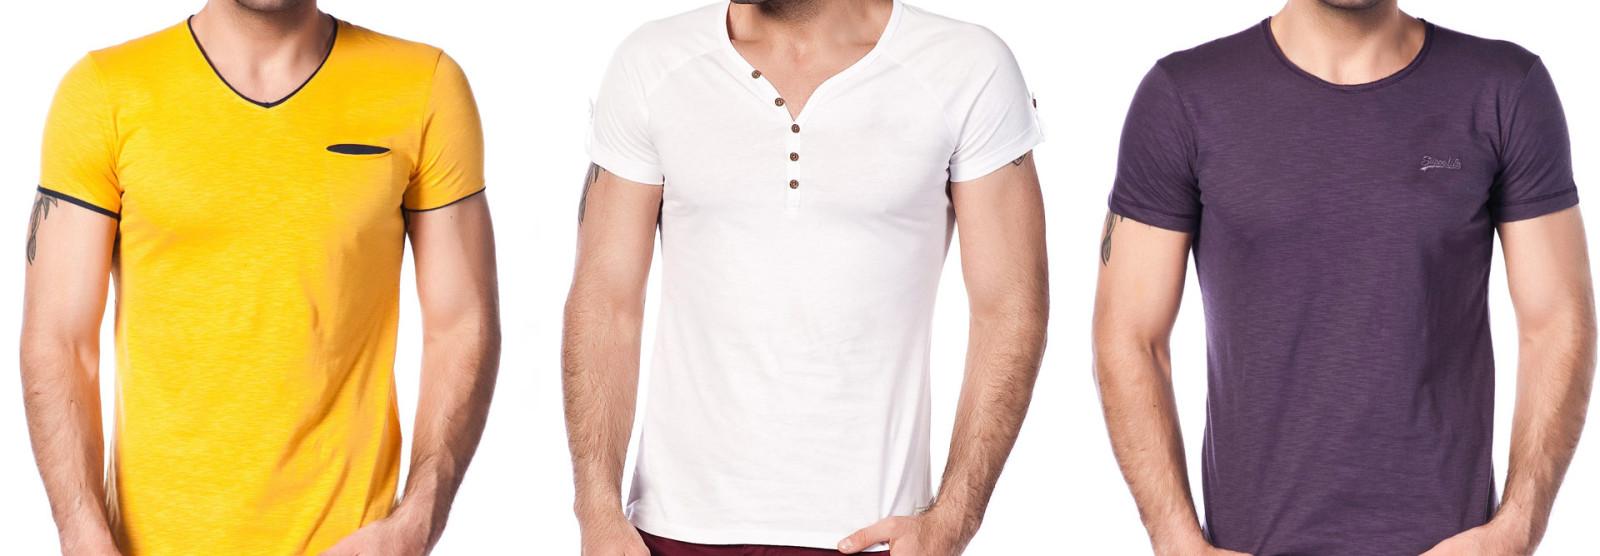 TeeBurn | Direct to Garment T-shirt Printing